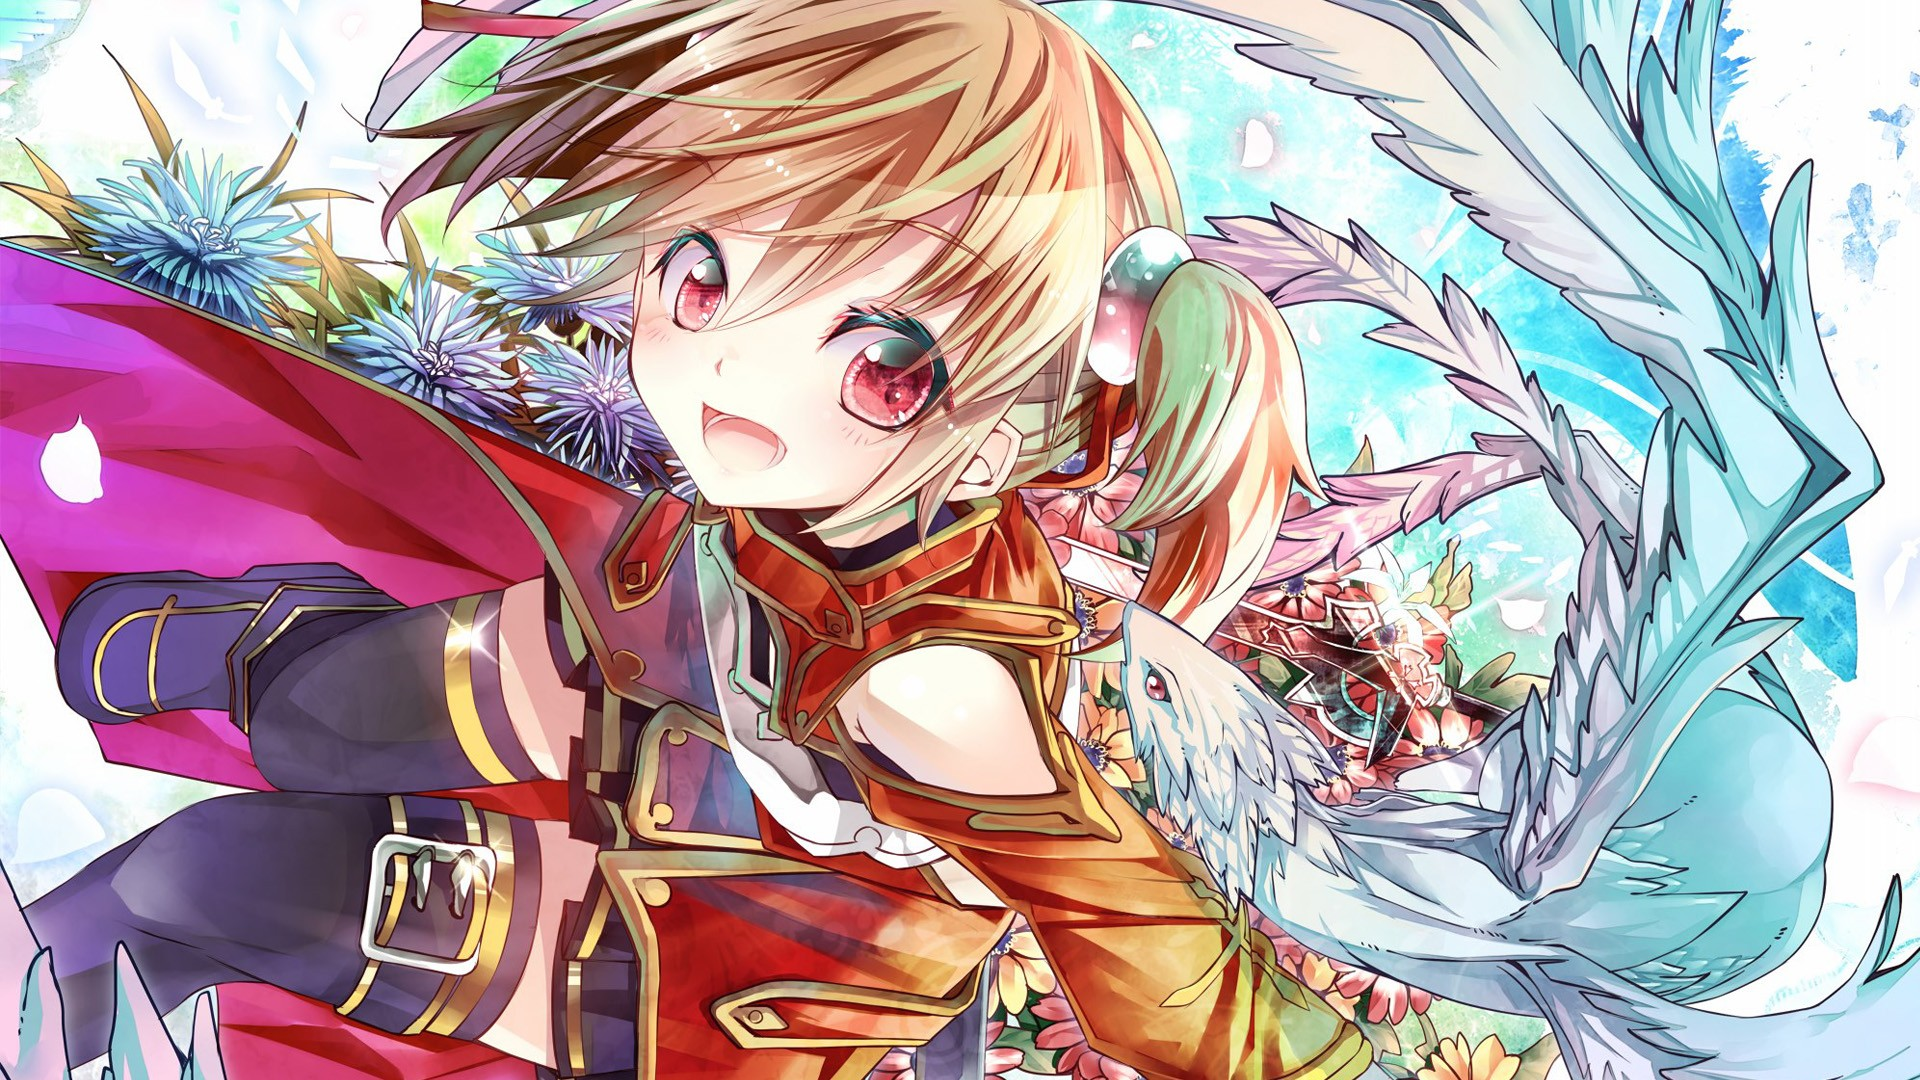 Anime Manga Wallpapers Full HD Download 1920x1080